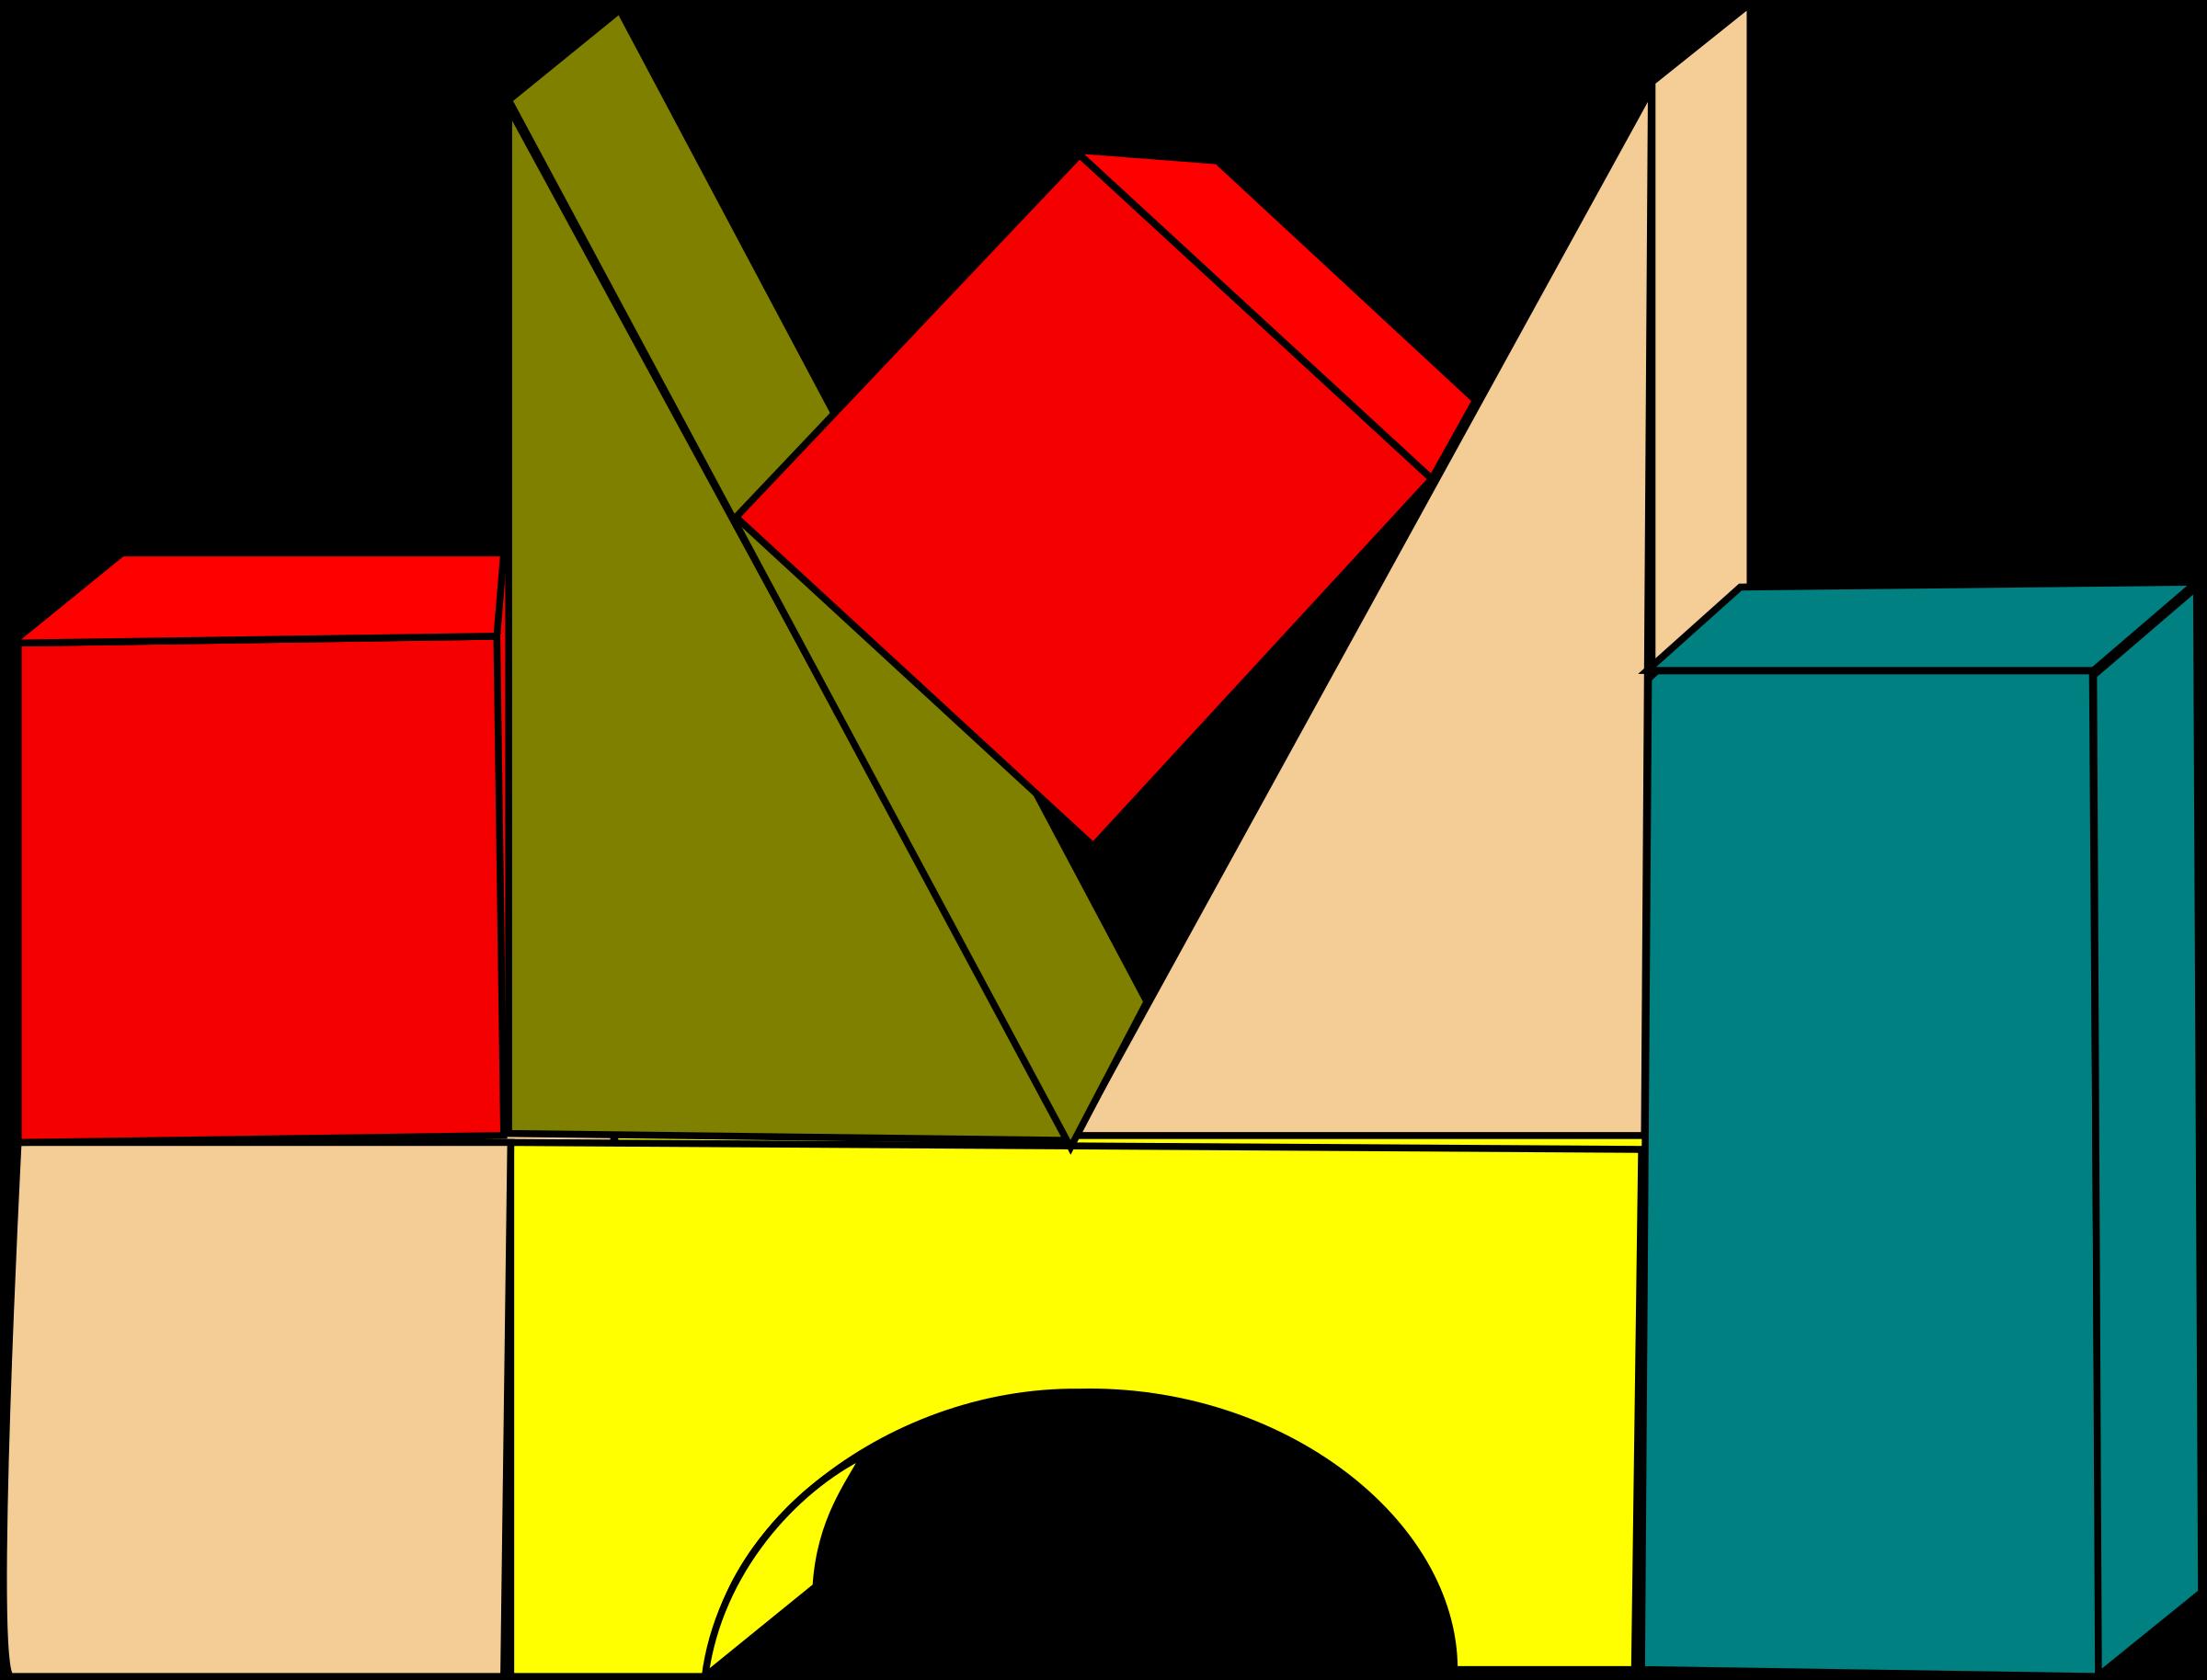 Lego clipart block tower Clip Block Art Panda Letters